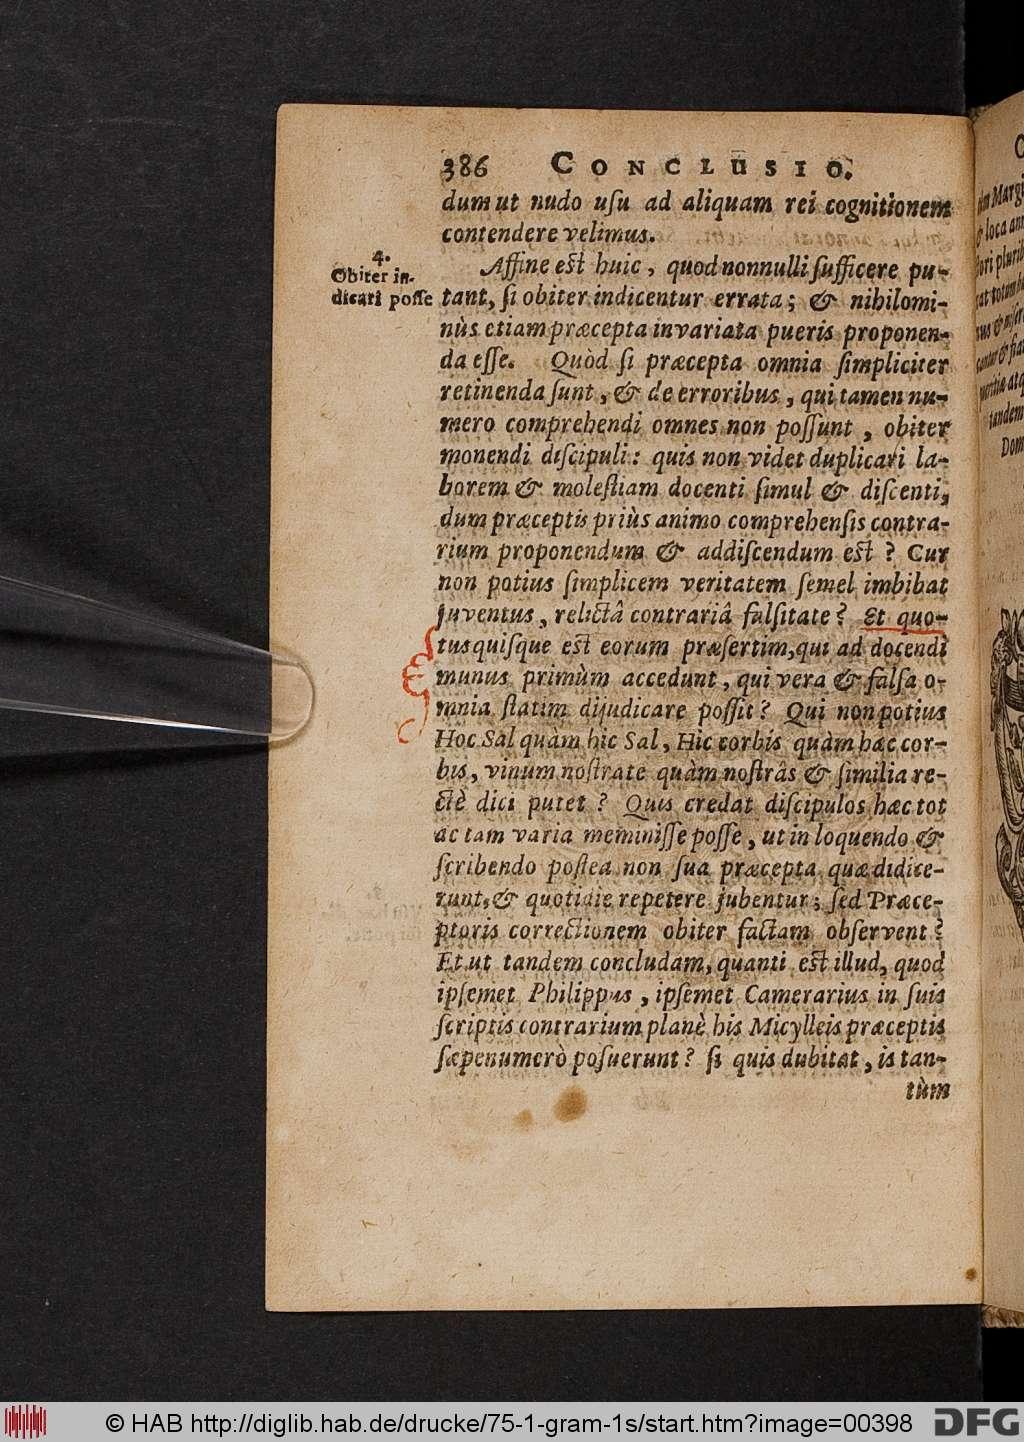 http://diglib.hab.de/drucke/75-1-gram-1s/00398.jpg